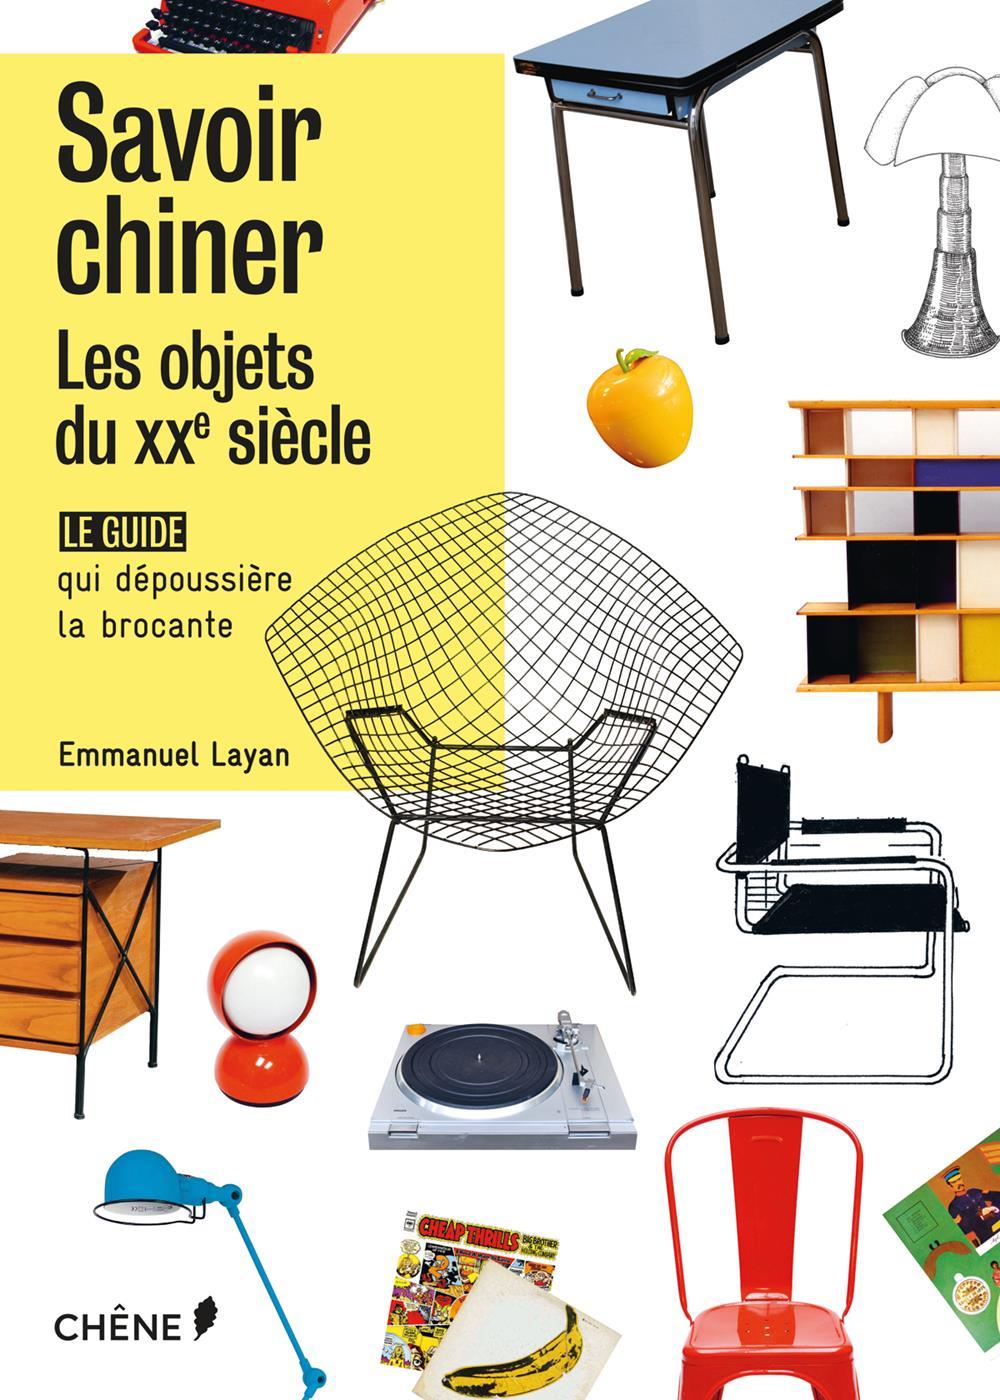 Savoir chiner, livro de Emmanuel Layan